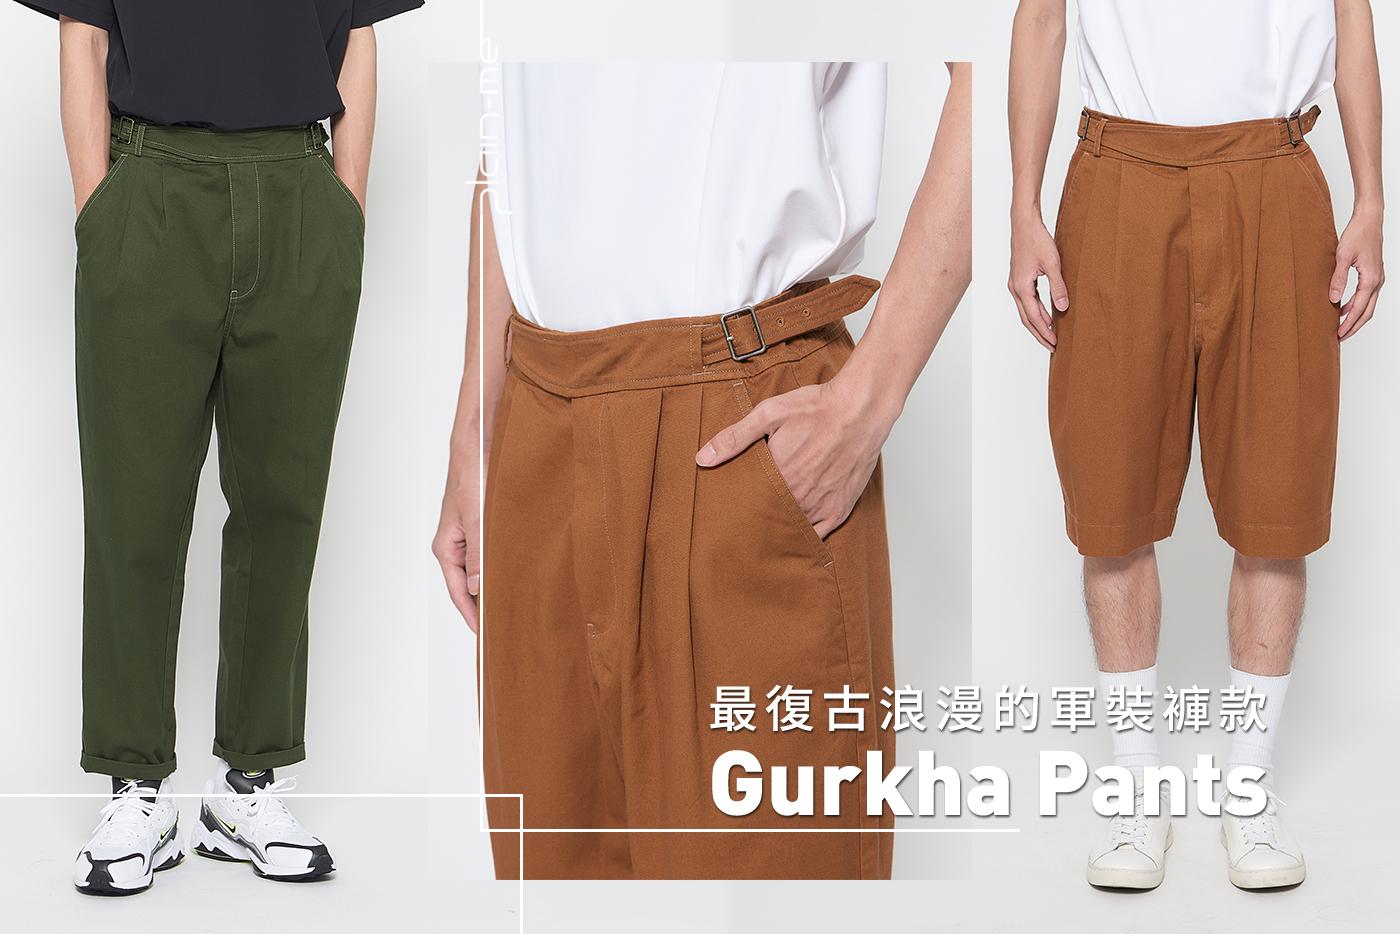 gurkha,gurkha pants,gurkha shorts,gurkha 褲,gurkha trousers,gurkha 中文,